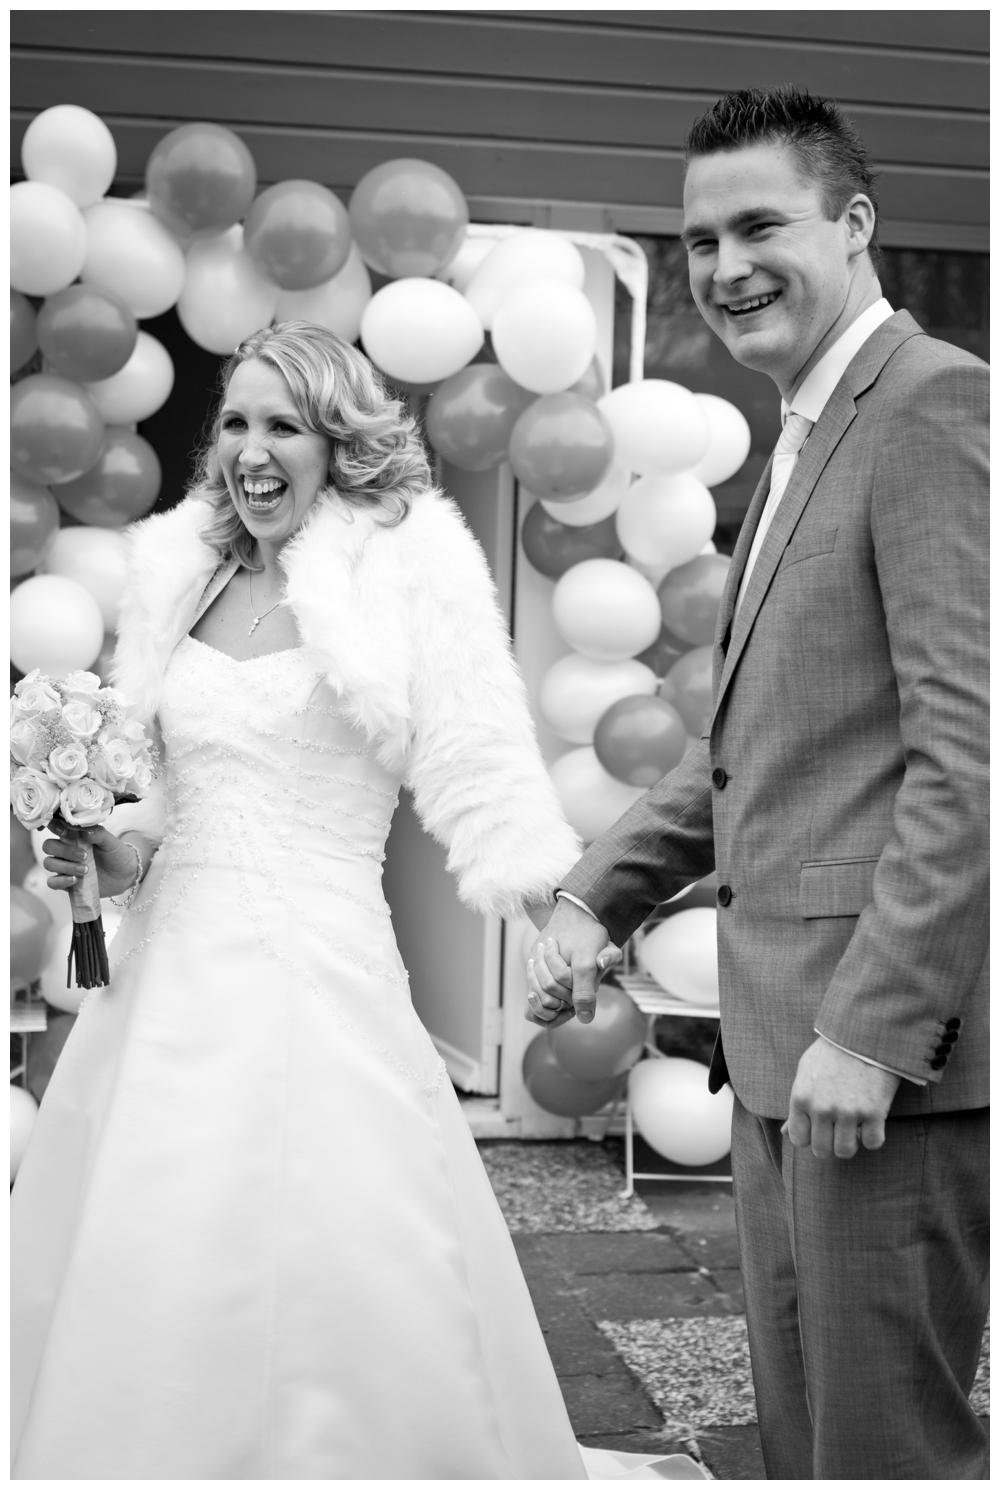 Wedding Robbert&Marlon ZW027.jpg